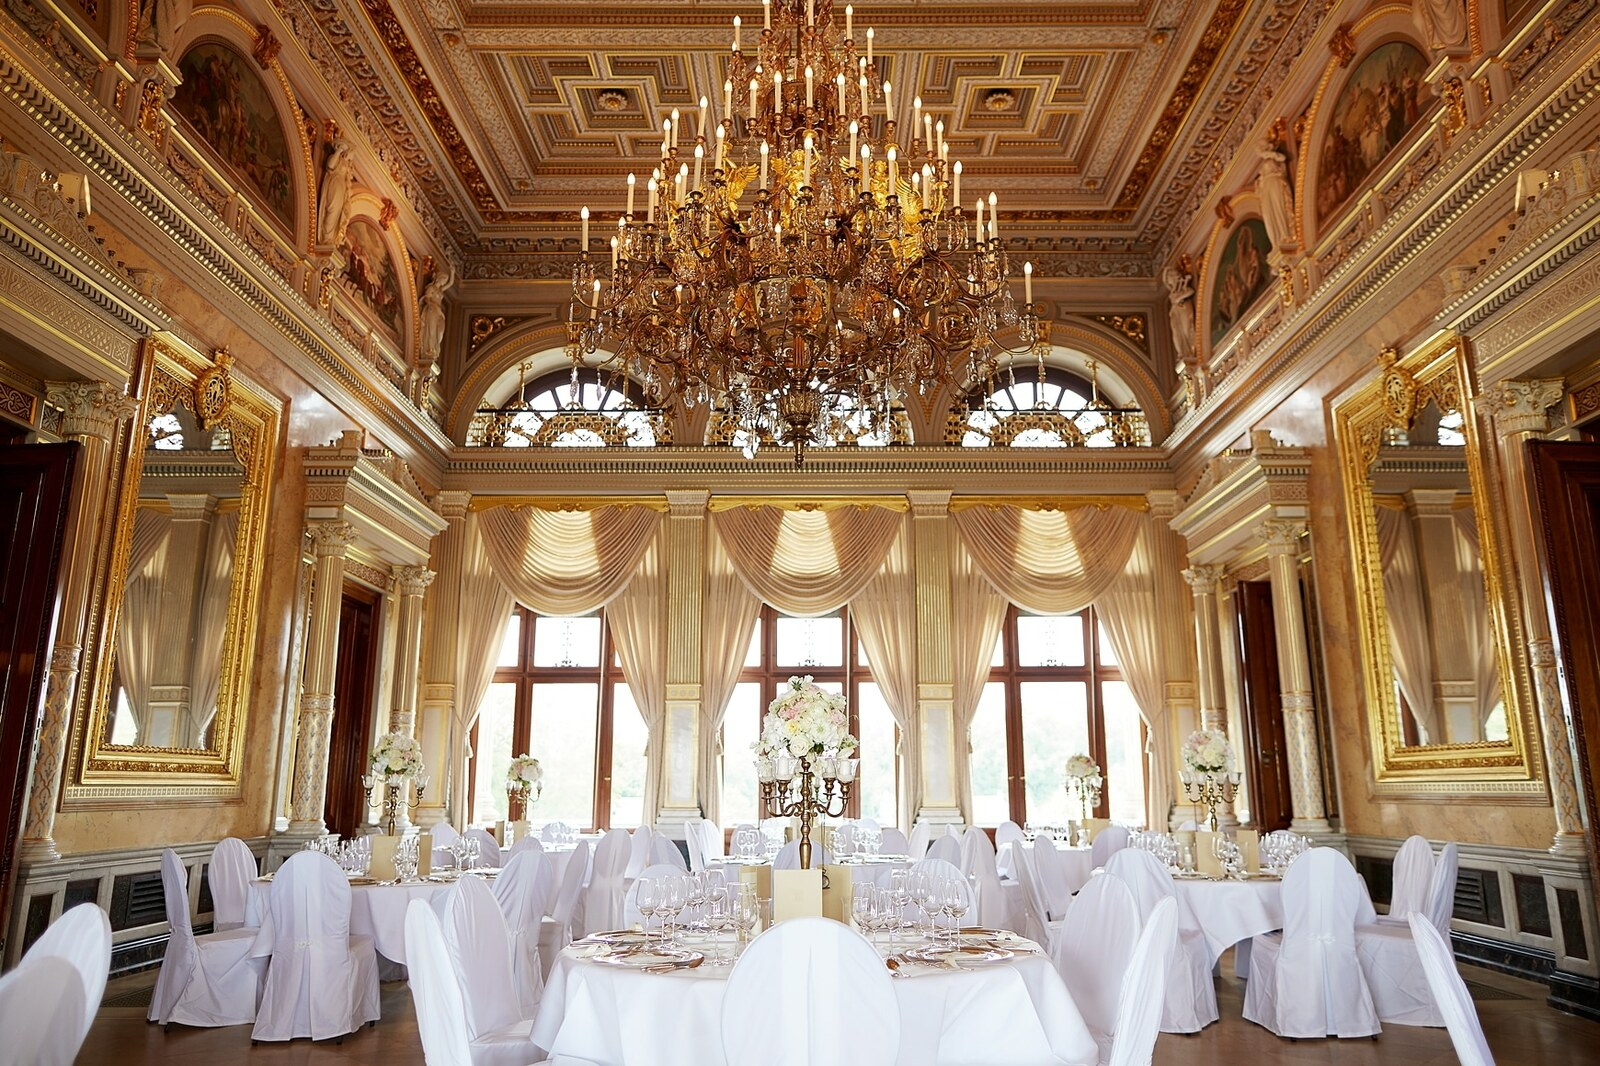 Der große Saal im Schloss Albrechtsberg festlich dekoriert